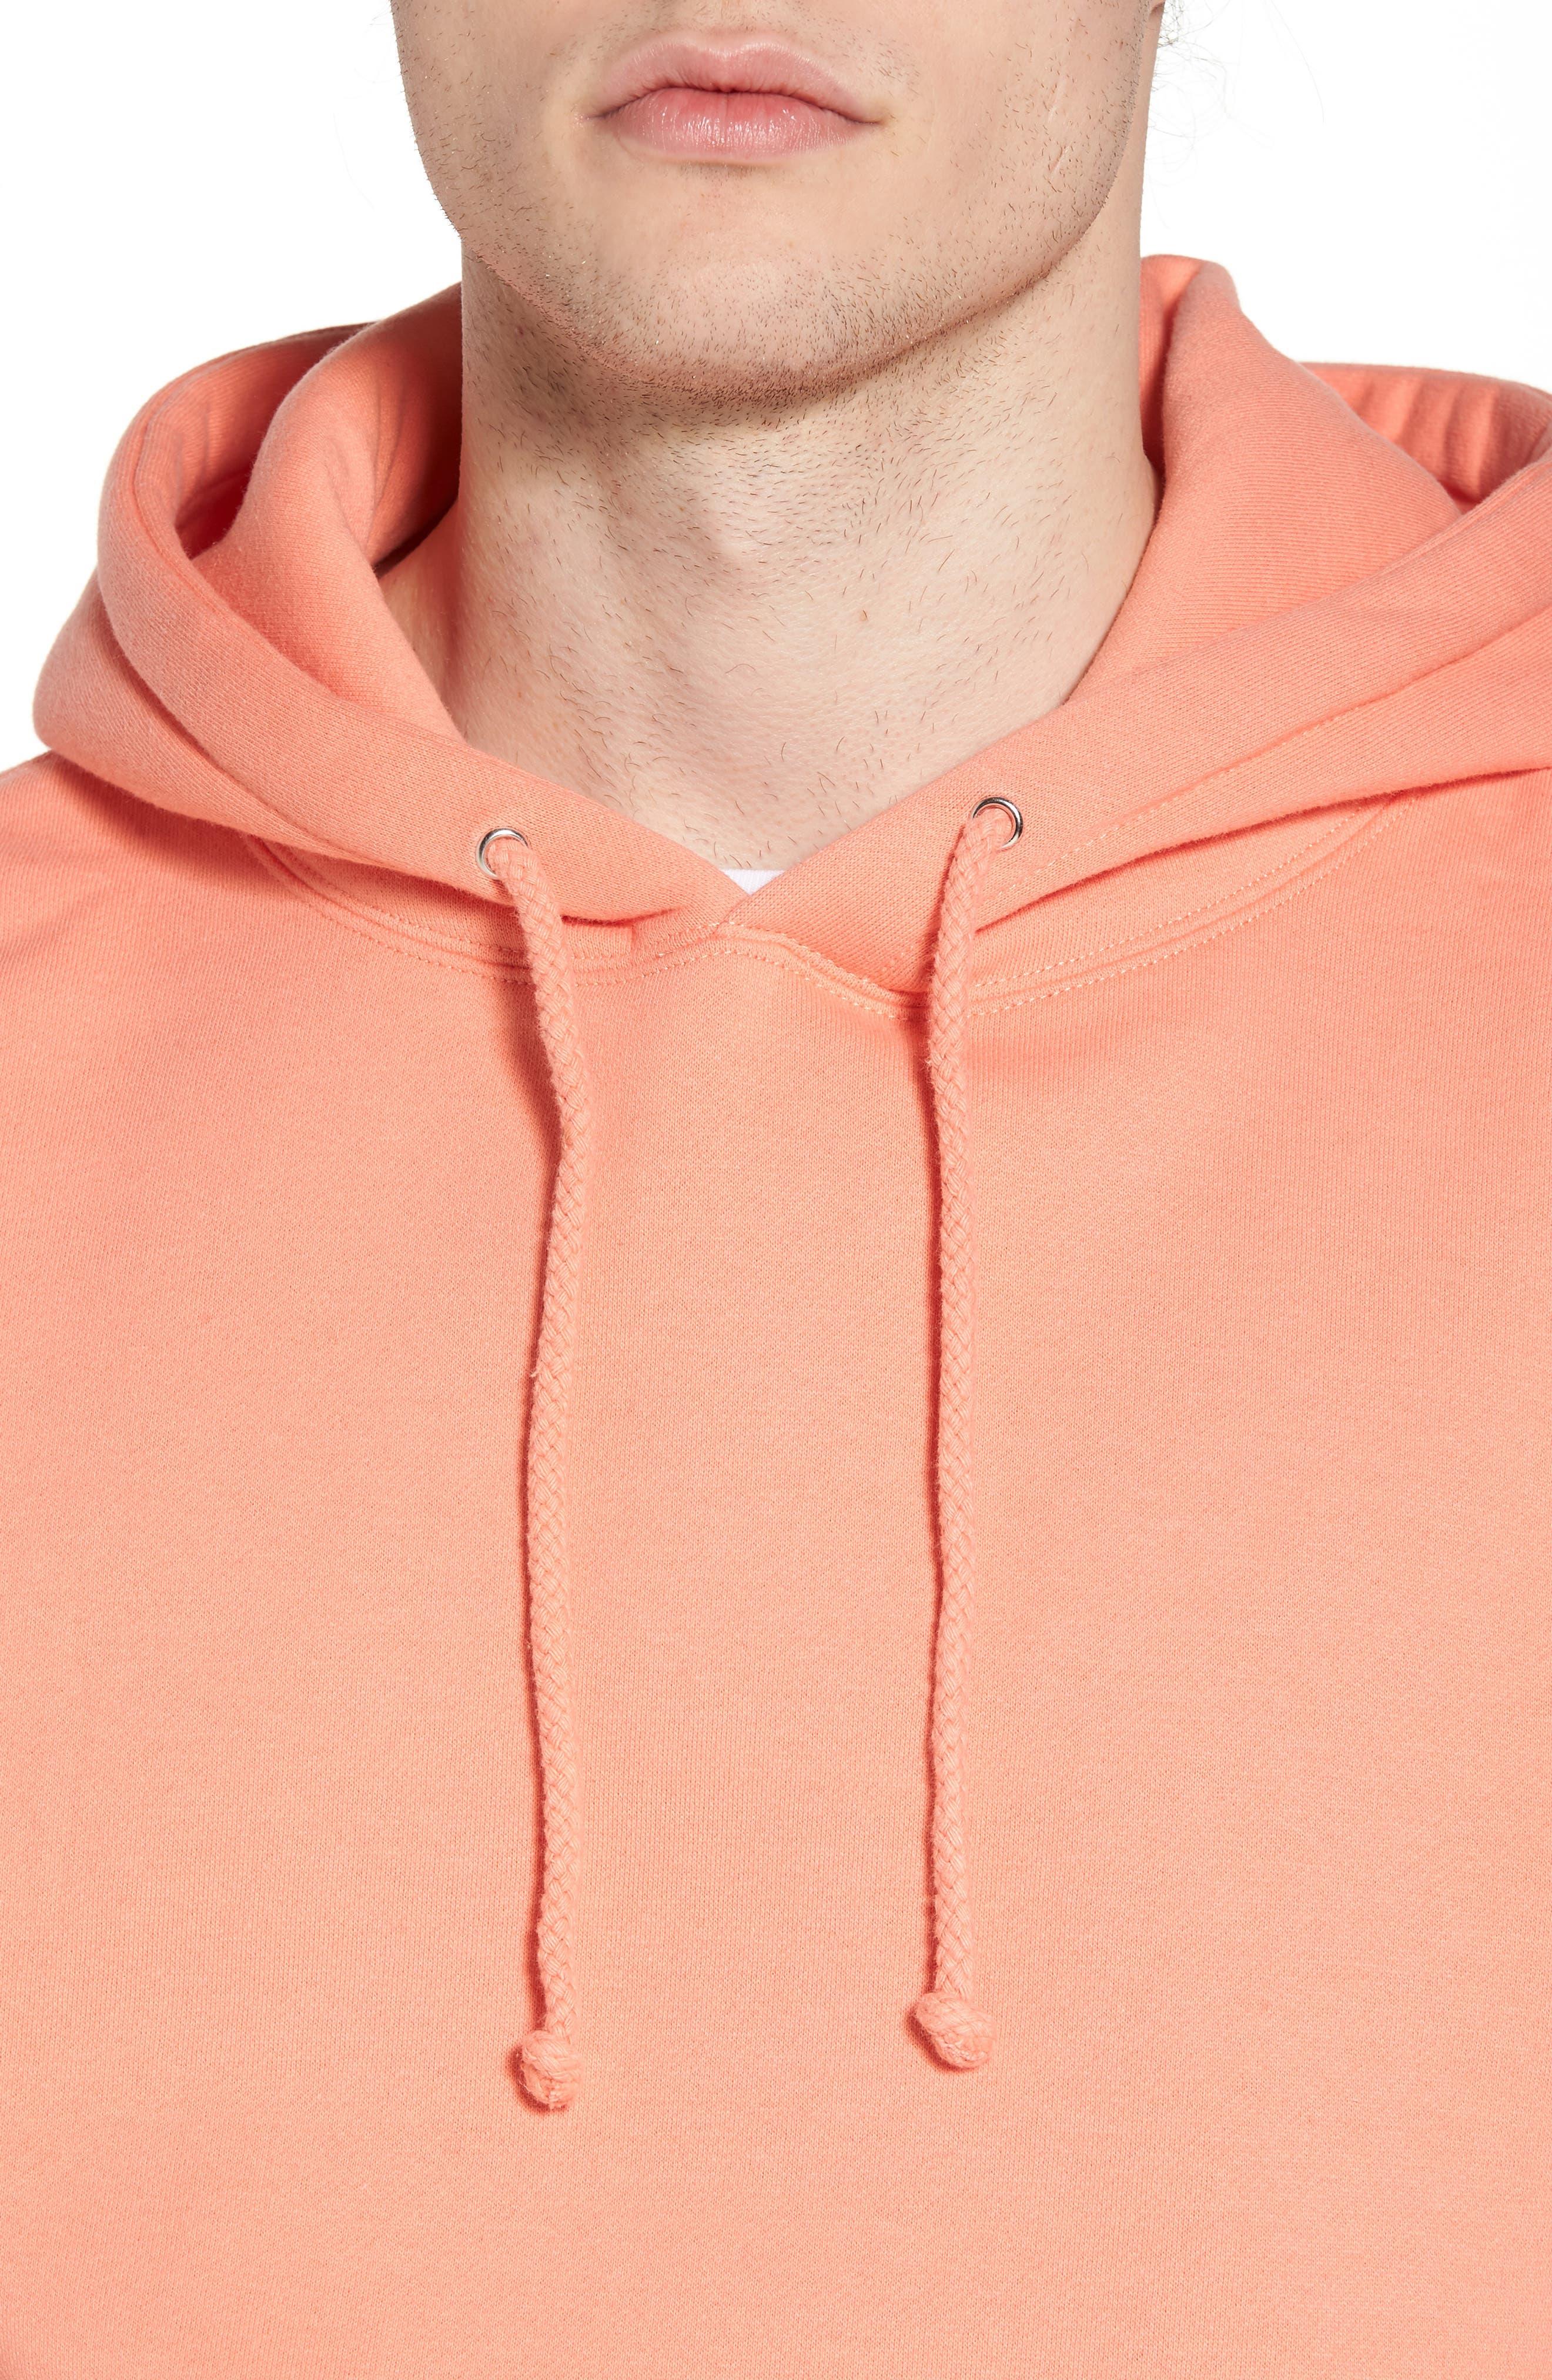 Tunnel Vision Hoodie Sweatshirt,                             Alternate thumbnail 4, color,